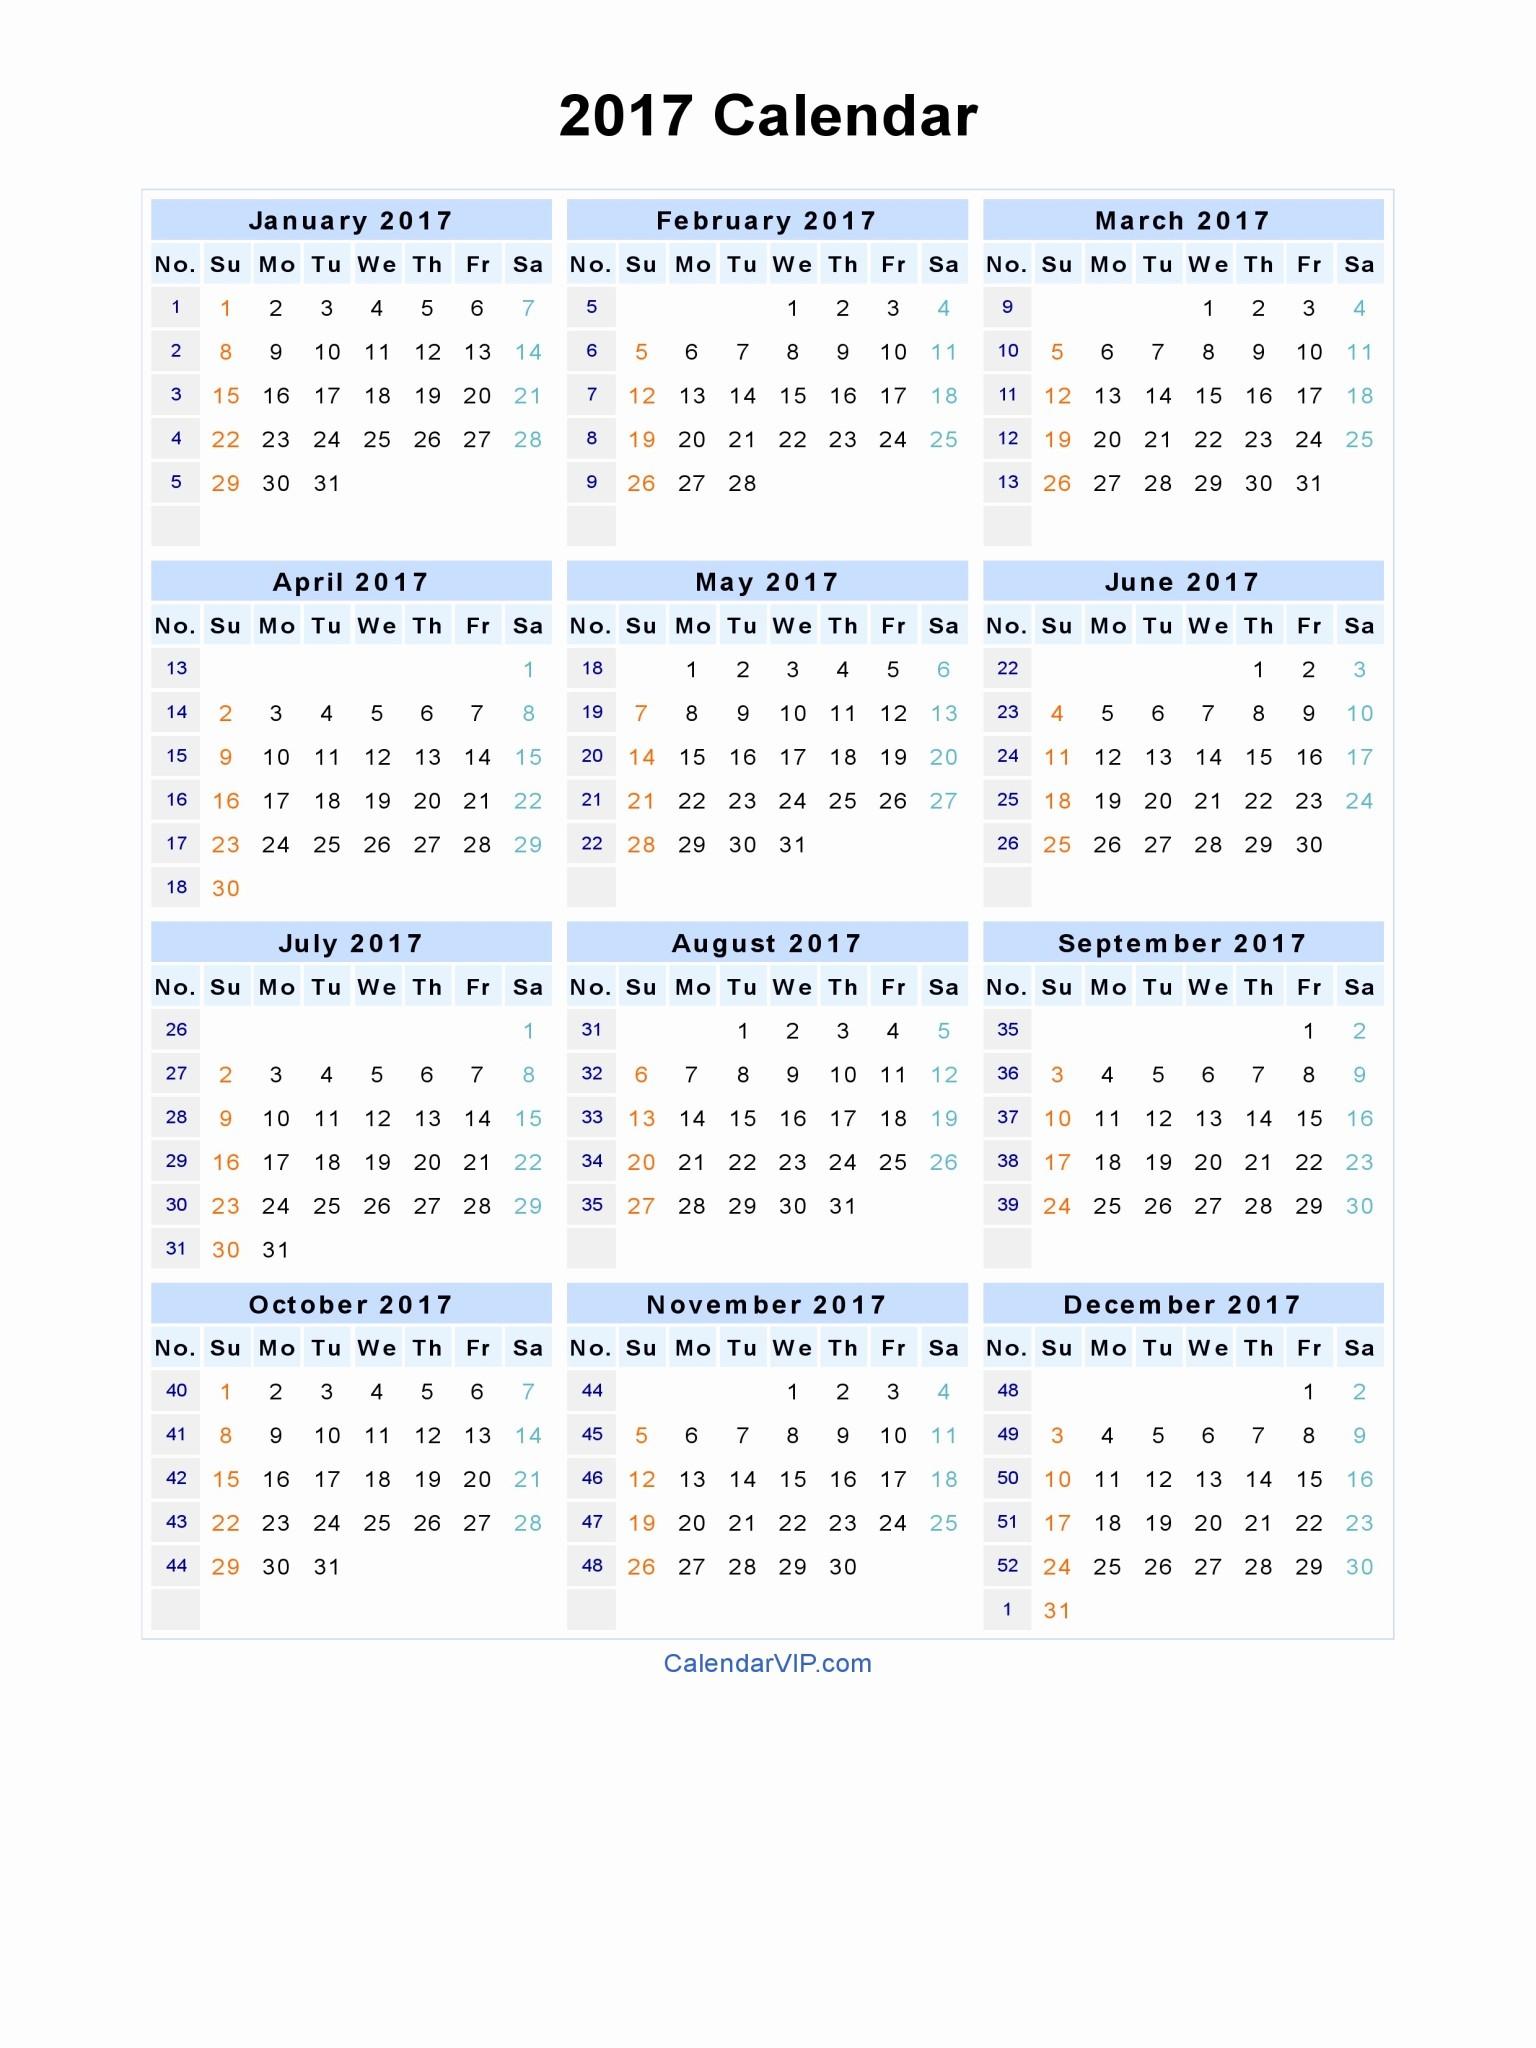 2017 Calendar Template Word Document Beautiful 2017 Printable Calendar Word